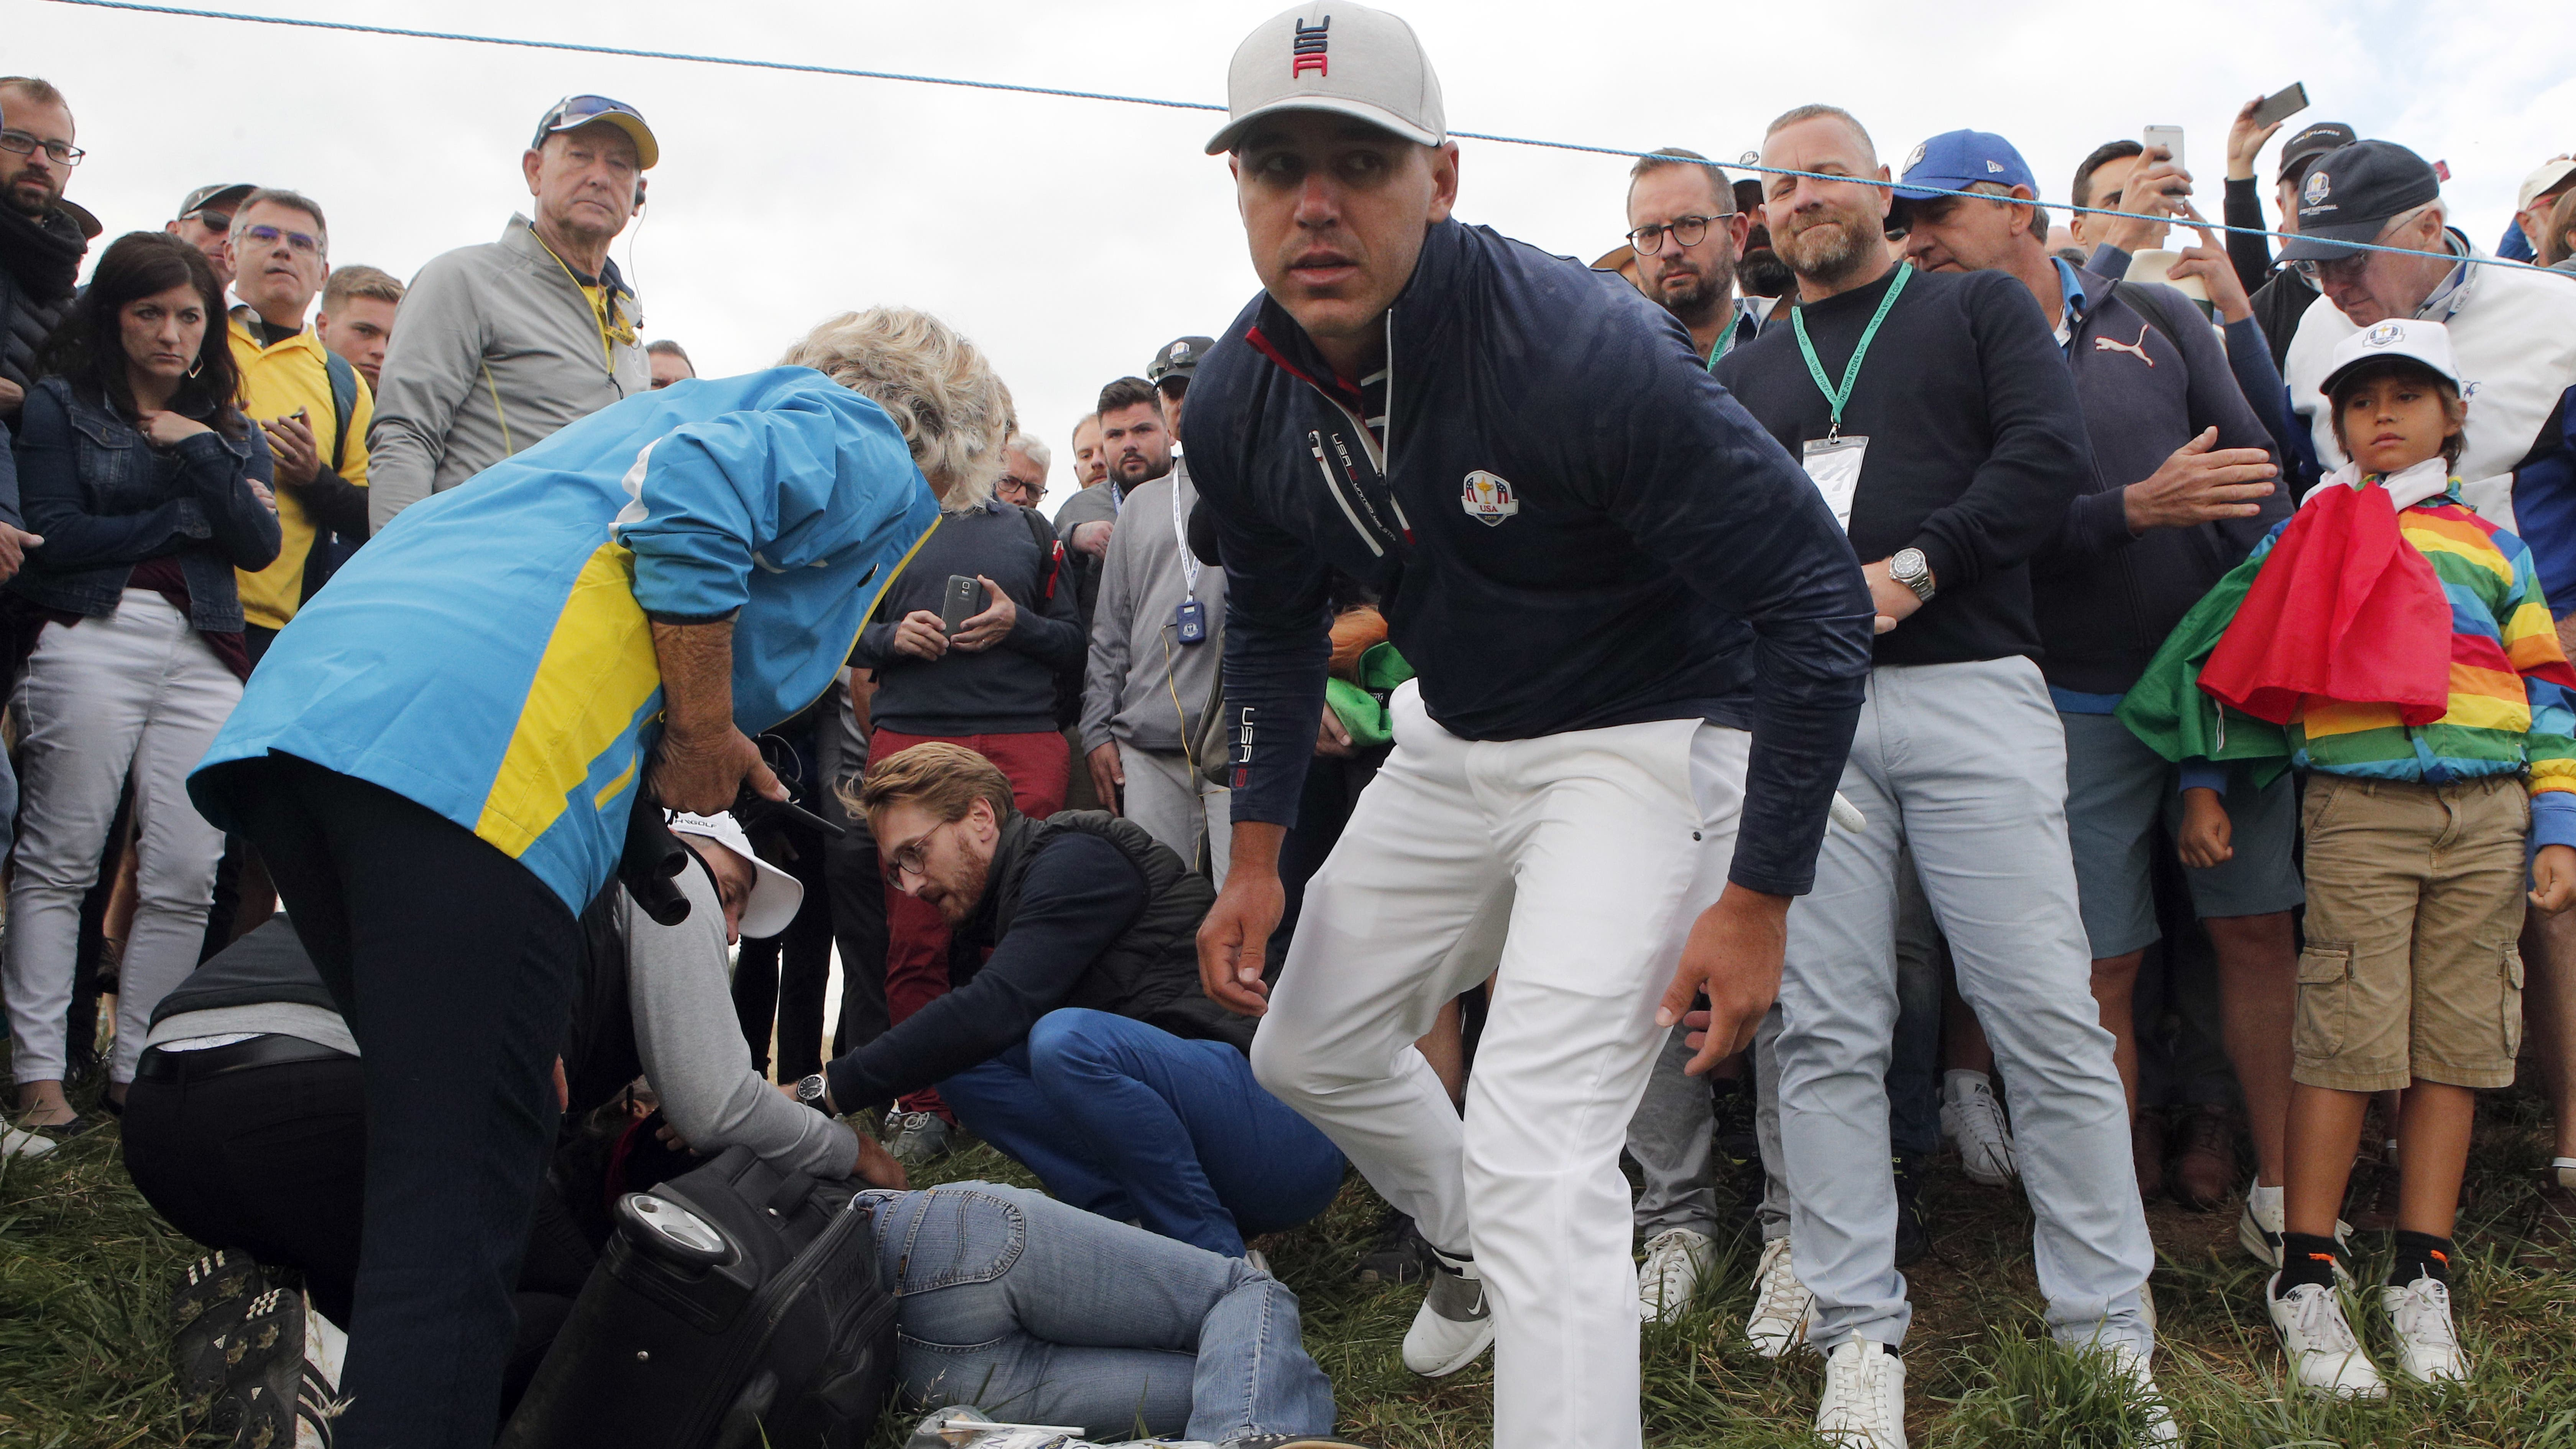 Brooks Koepka's tee shot on the sixth left a spectator needing treatment